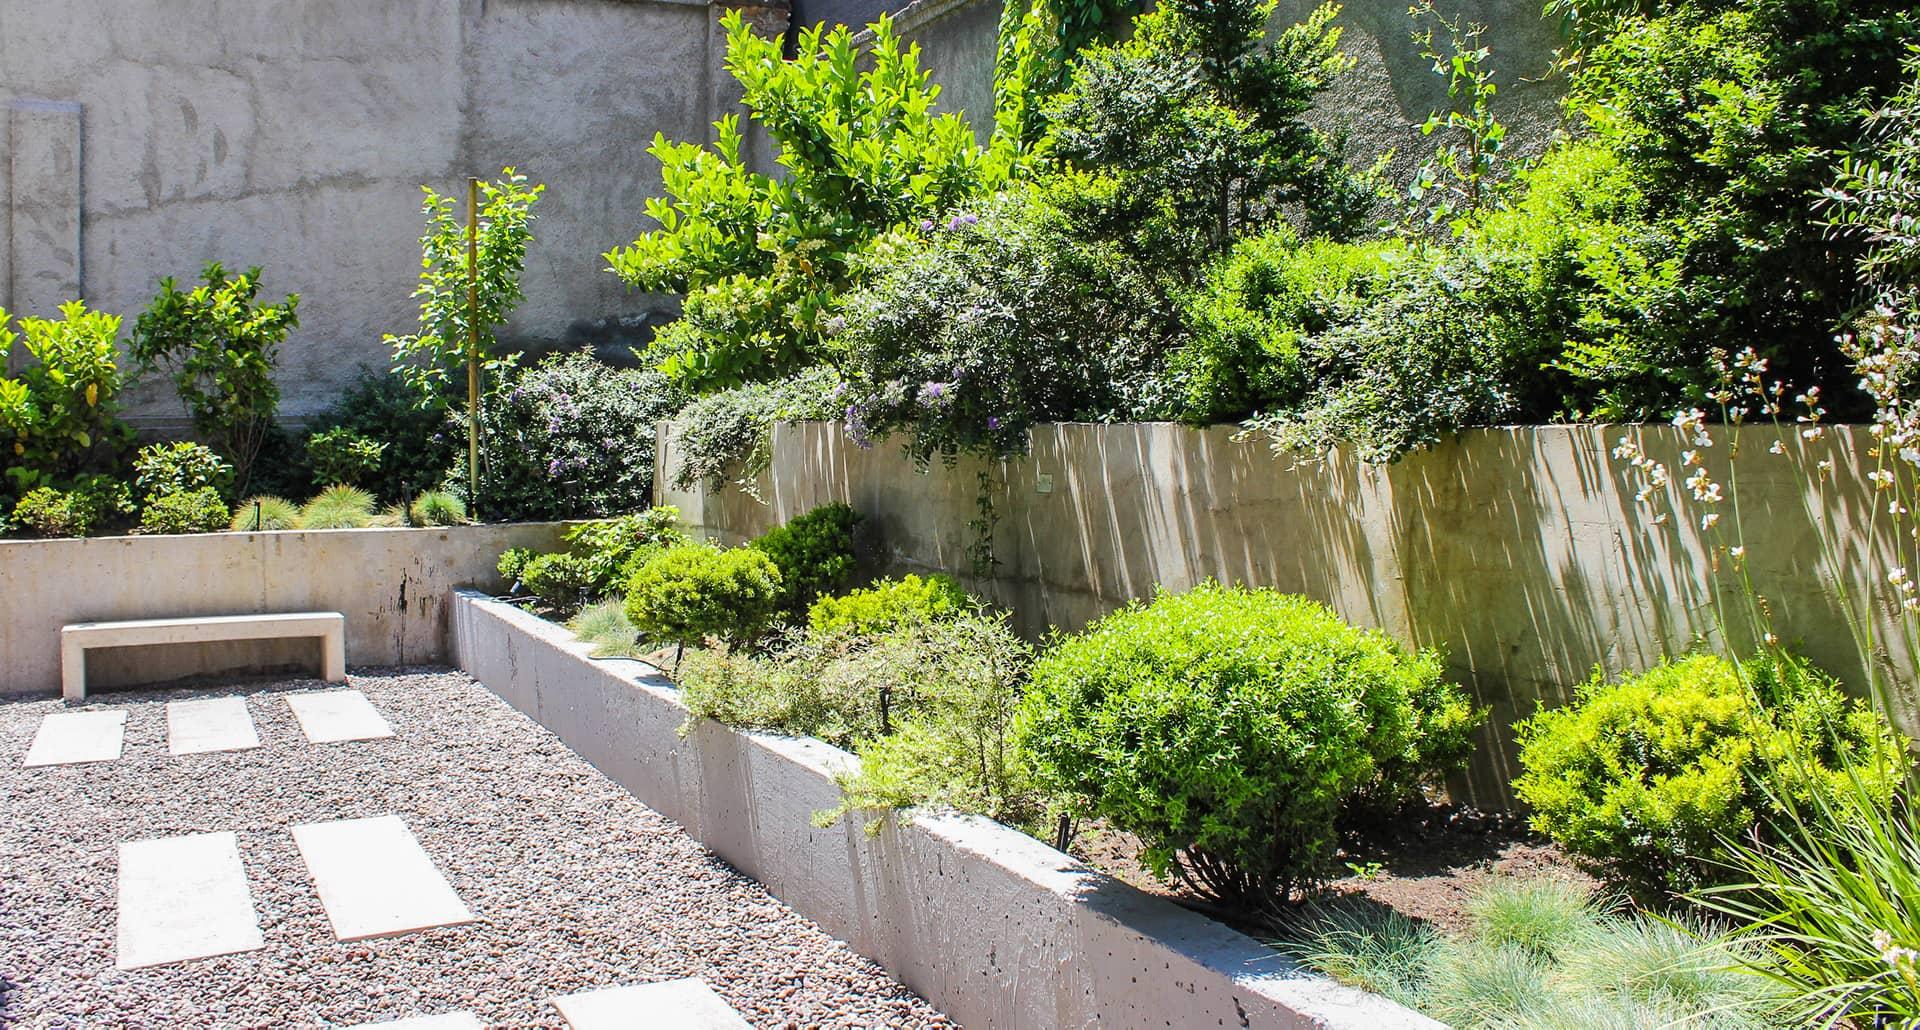 Arquitectura del paisaje for Arquitectura diseno y construccion